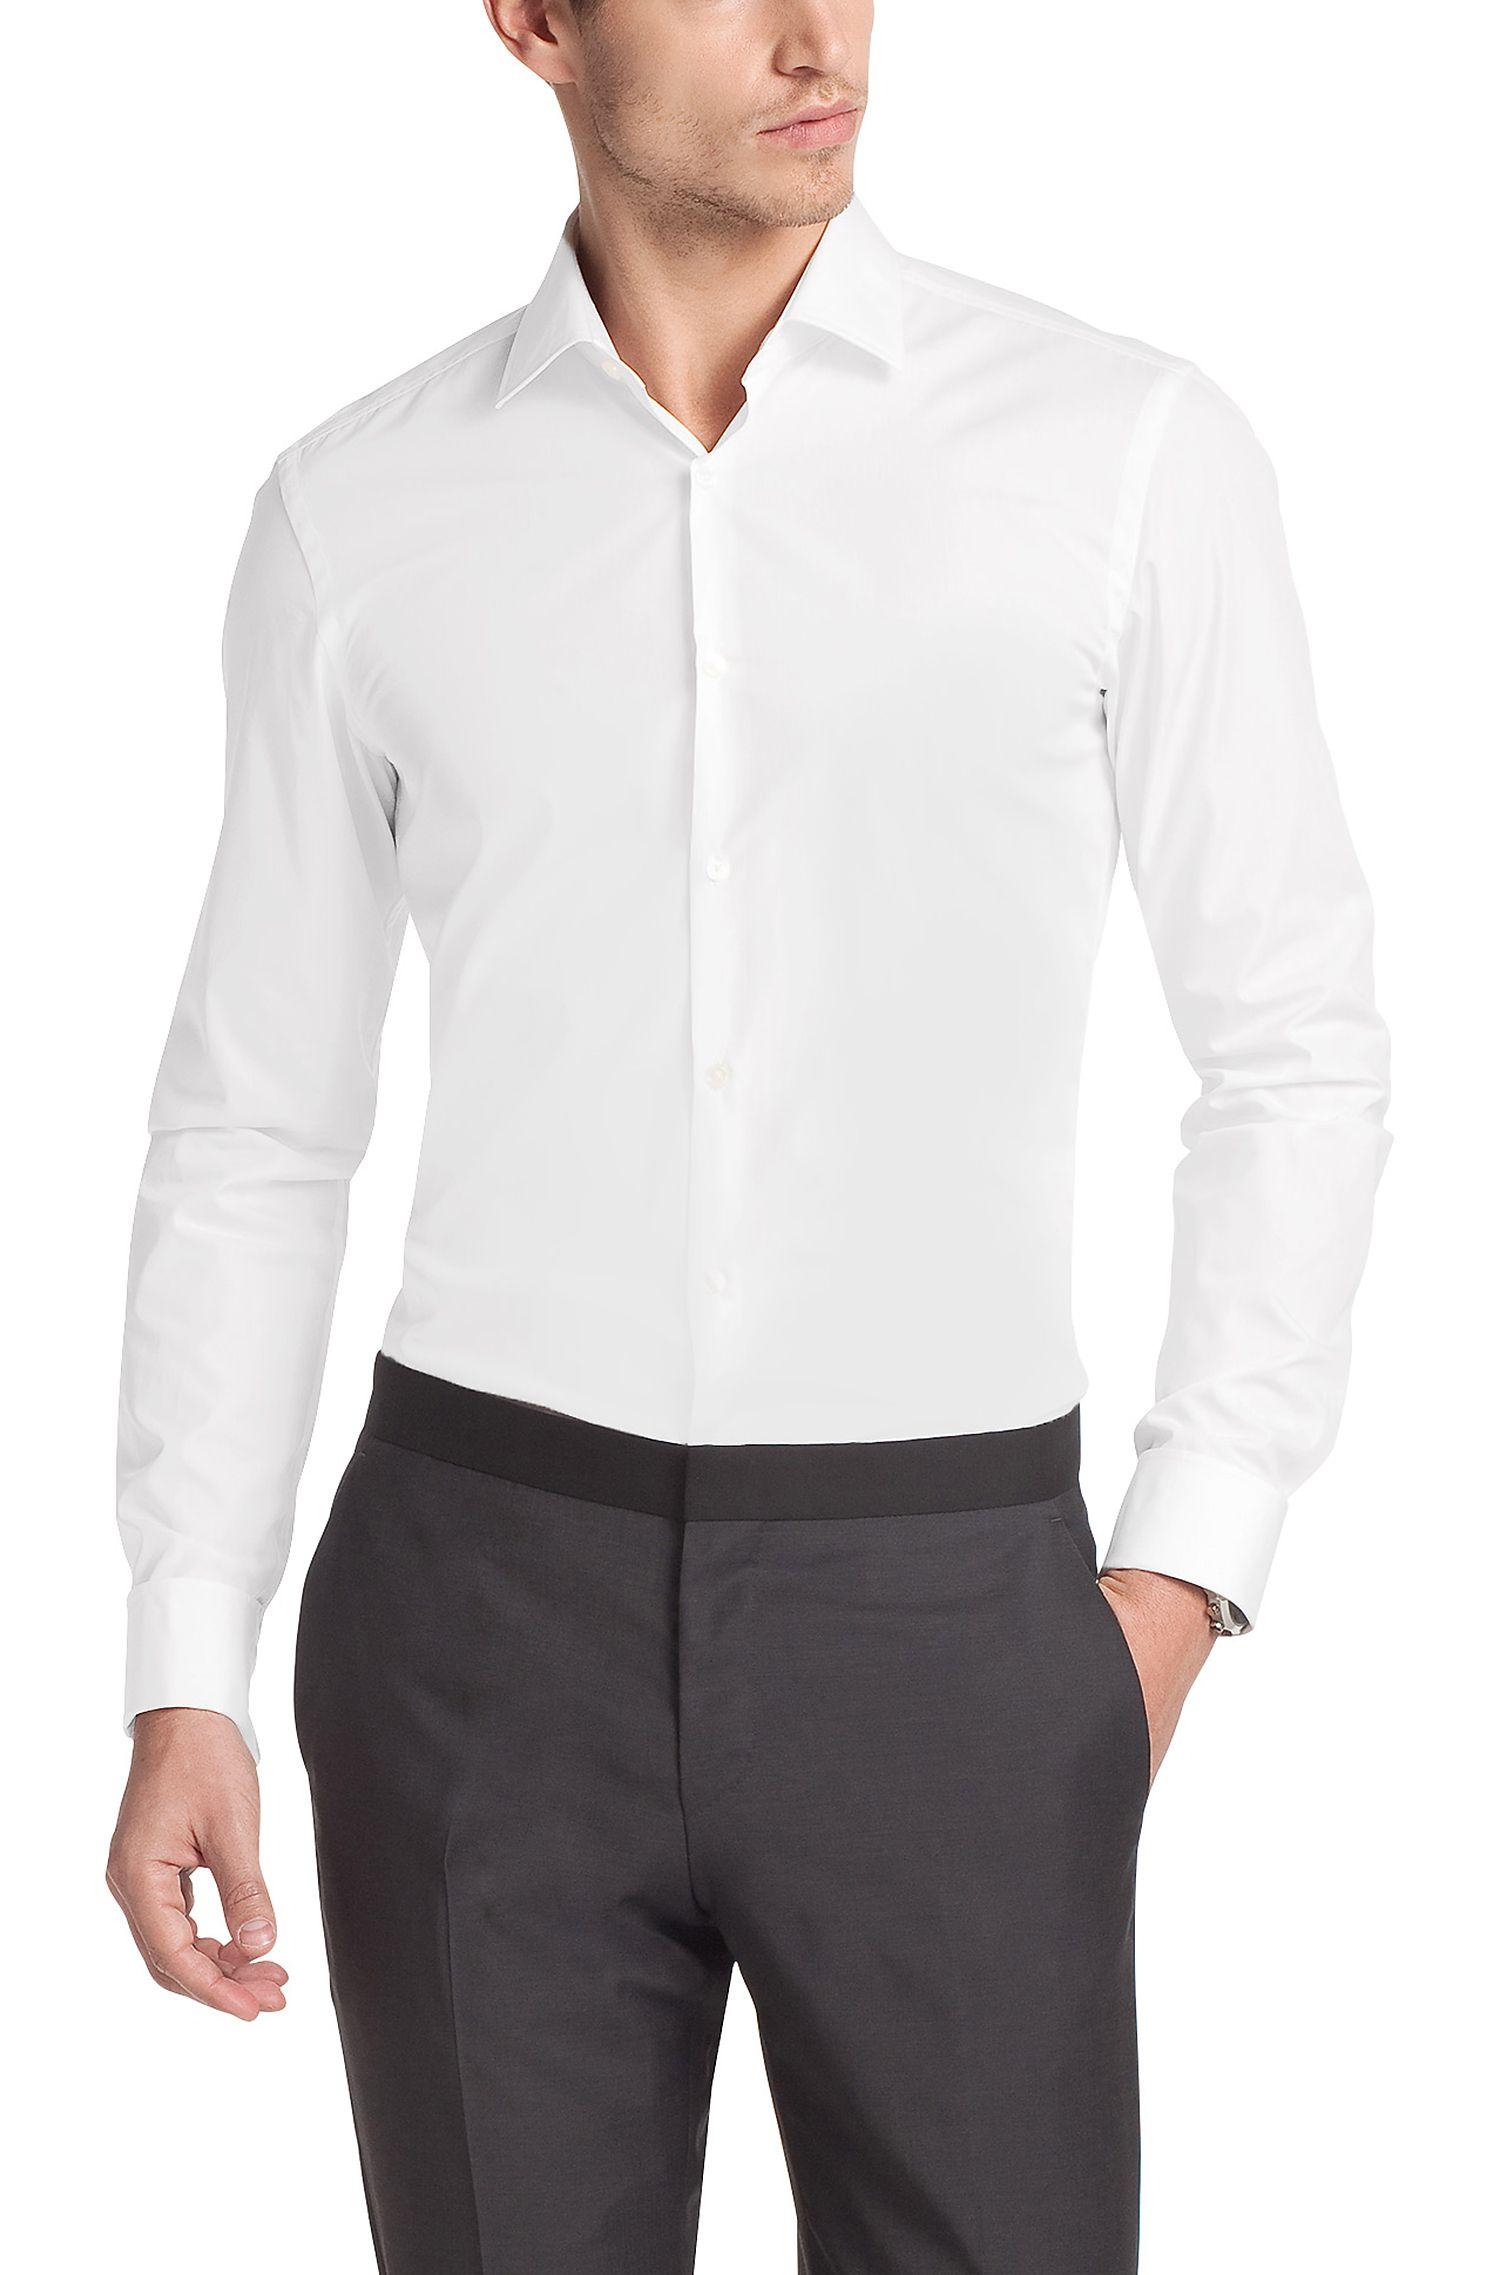 Ensemble «Jacques_E-BOX» avec chemise business